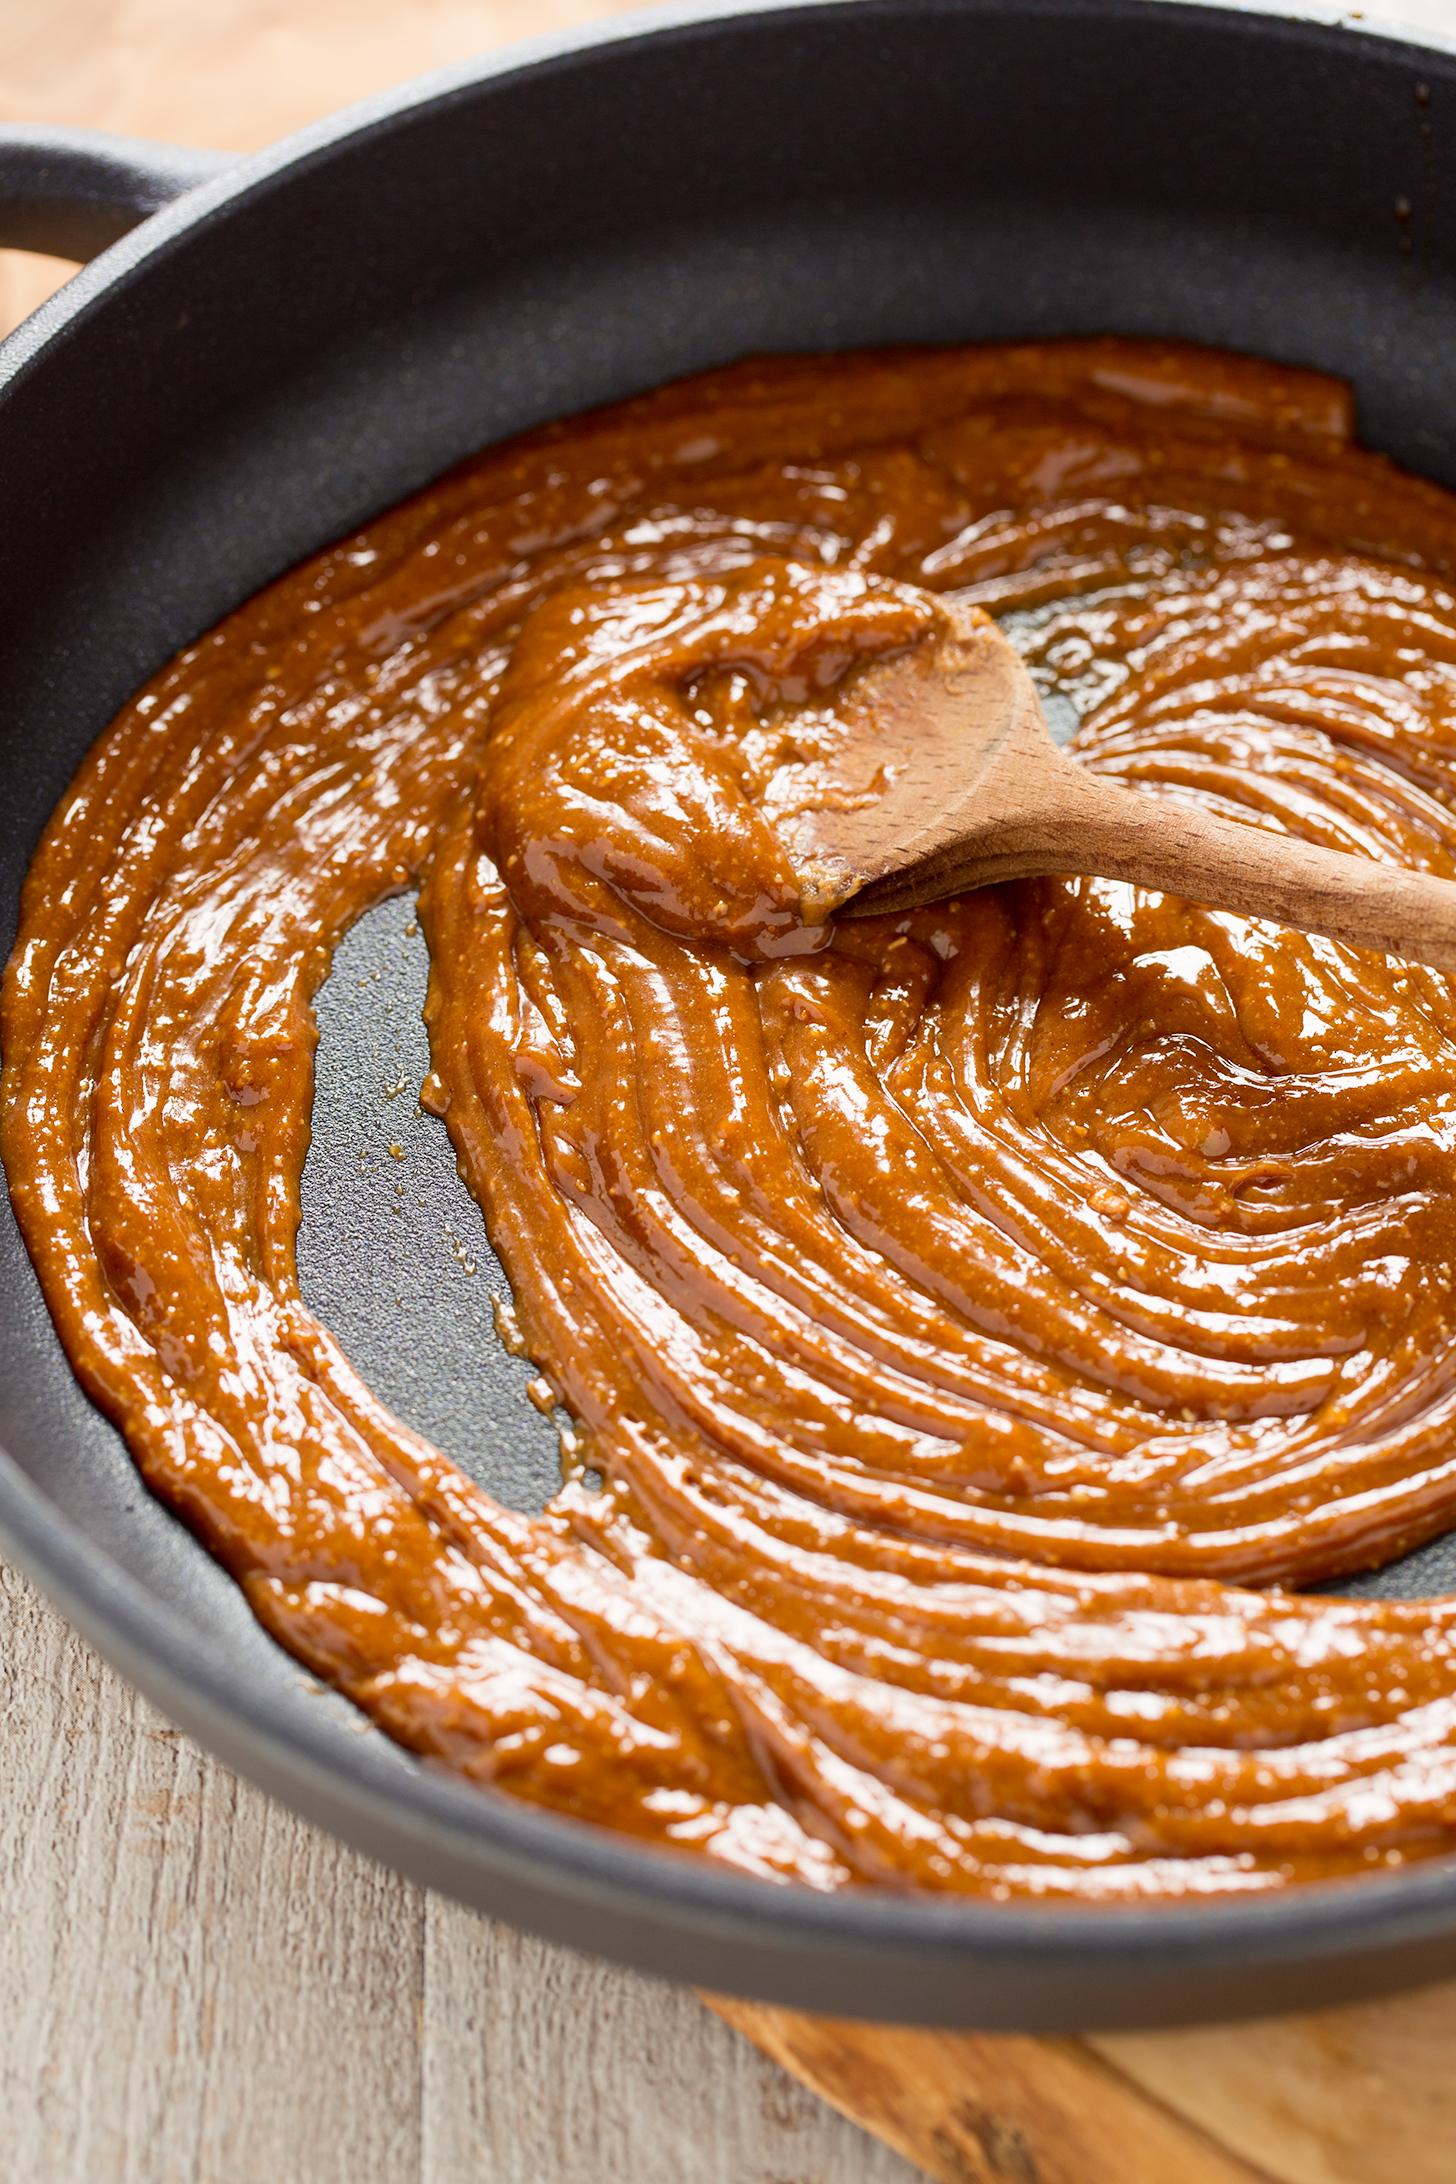 come fare barrette energetiche grano saraceno e peanut butter | how yo make puffed buckwheat peanut butter energy heart bars buckwheat recipe